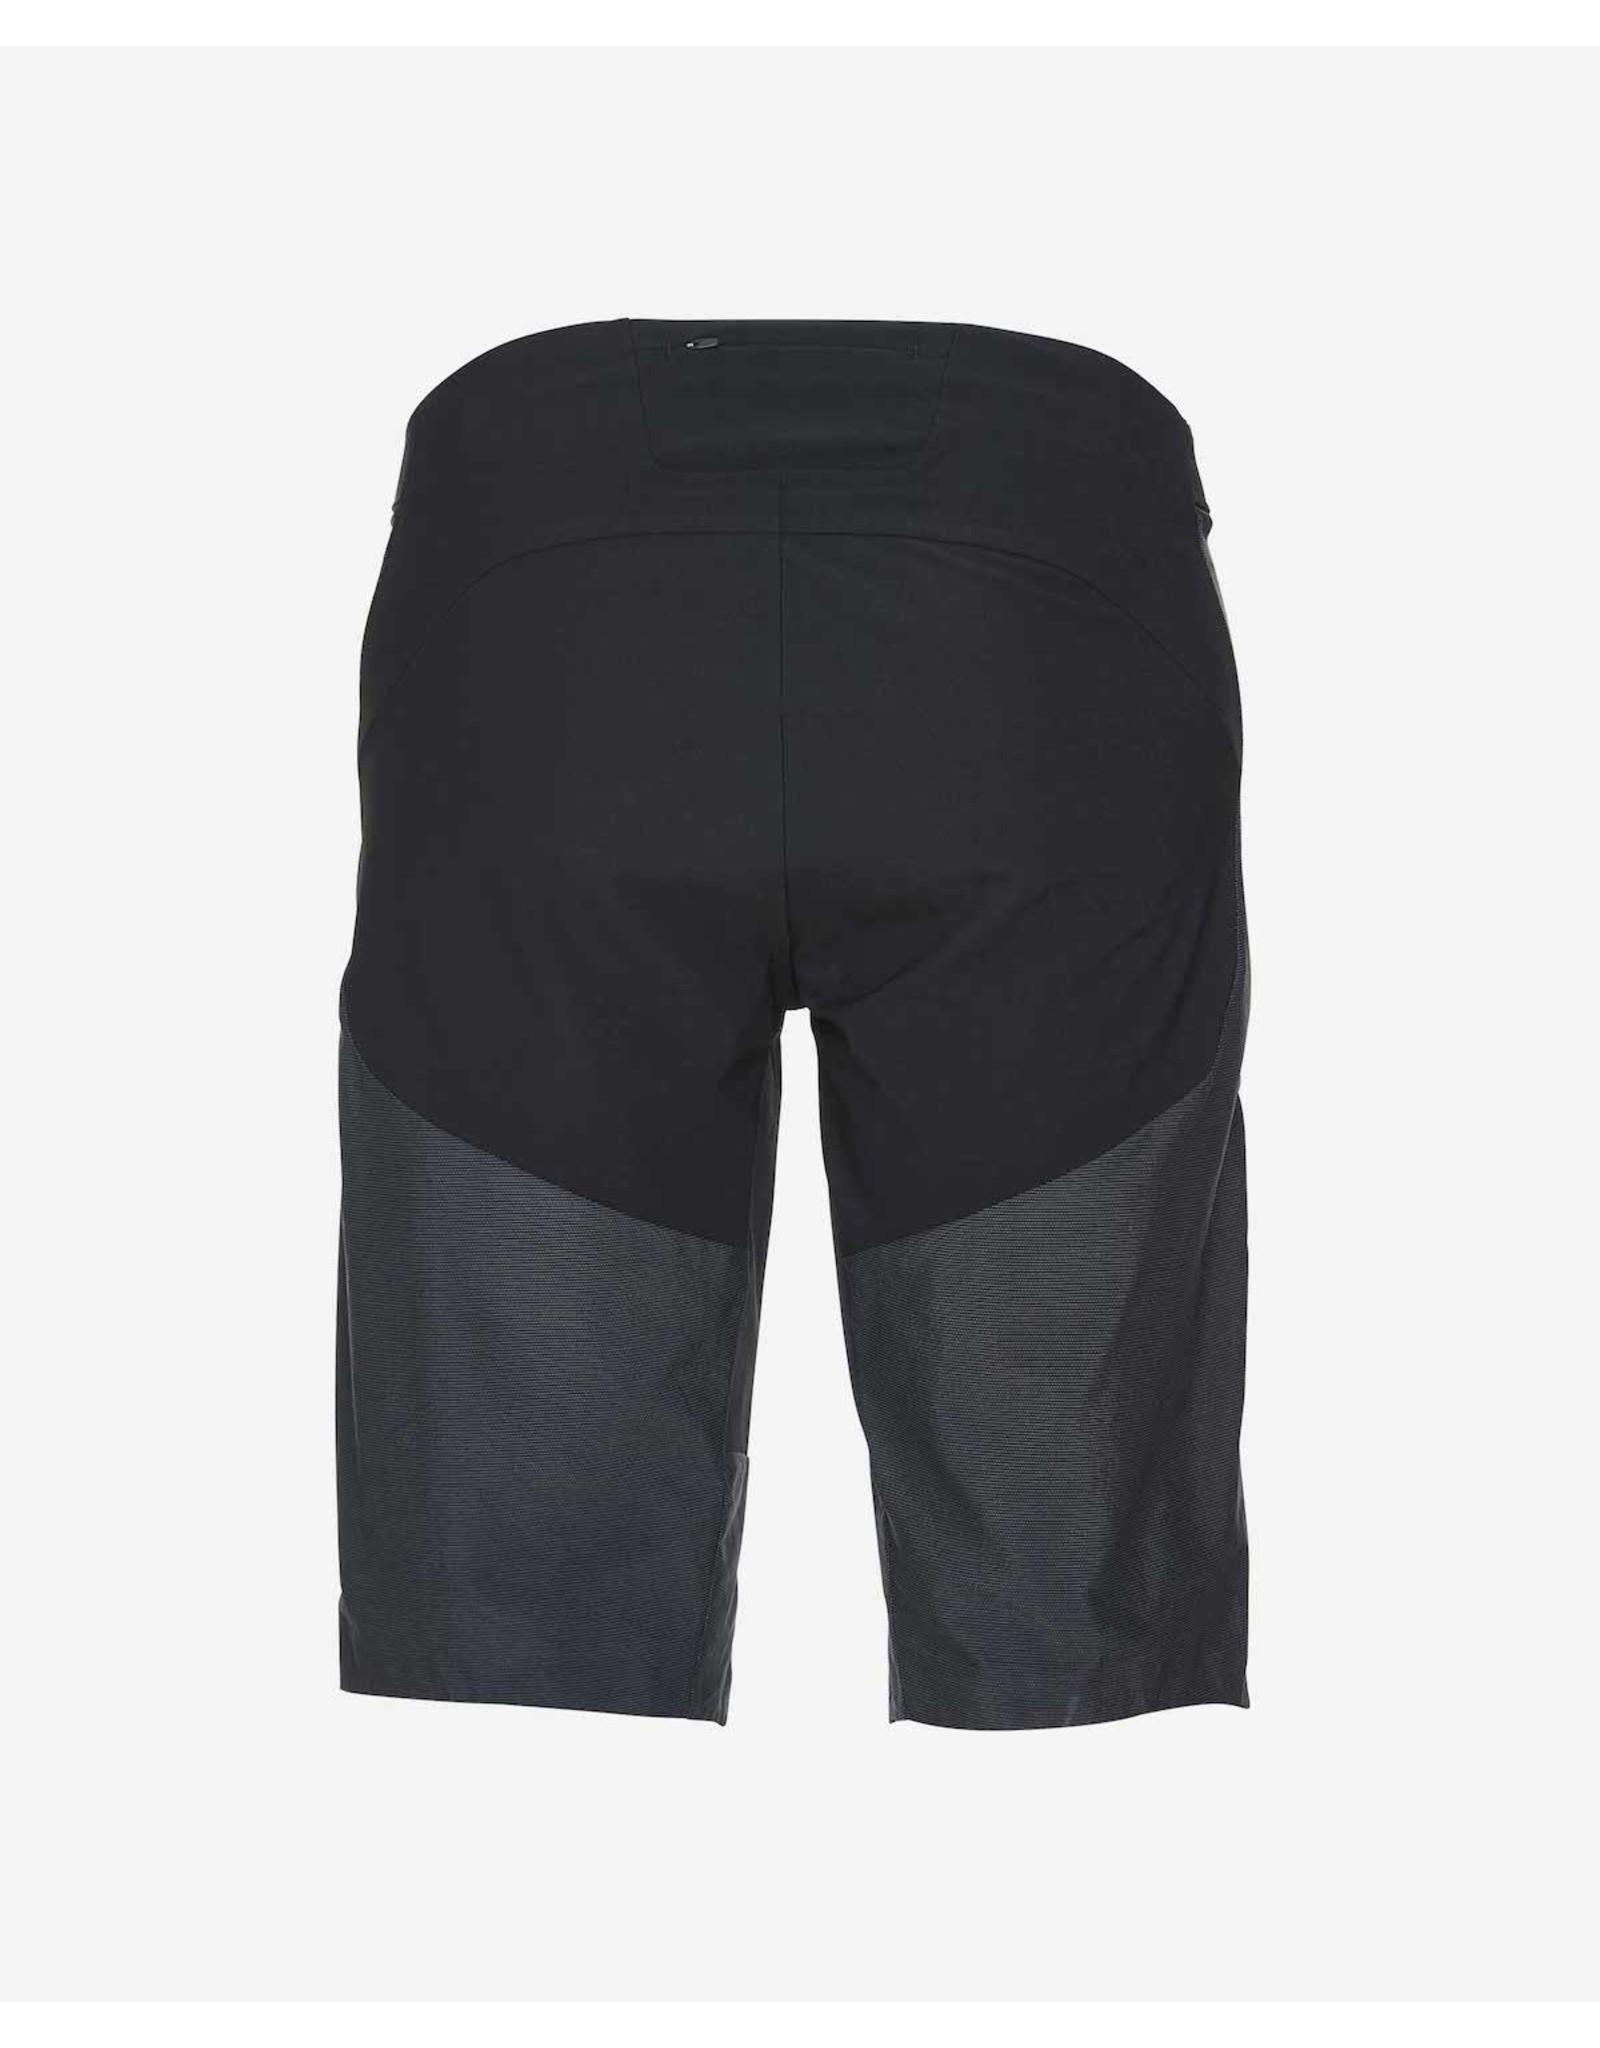 POC POC Resistance Enduro Shorts